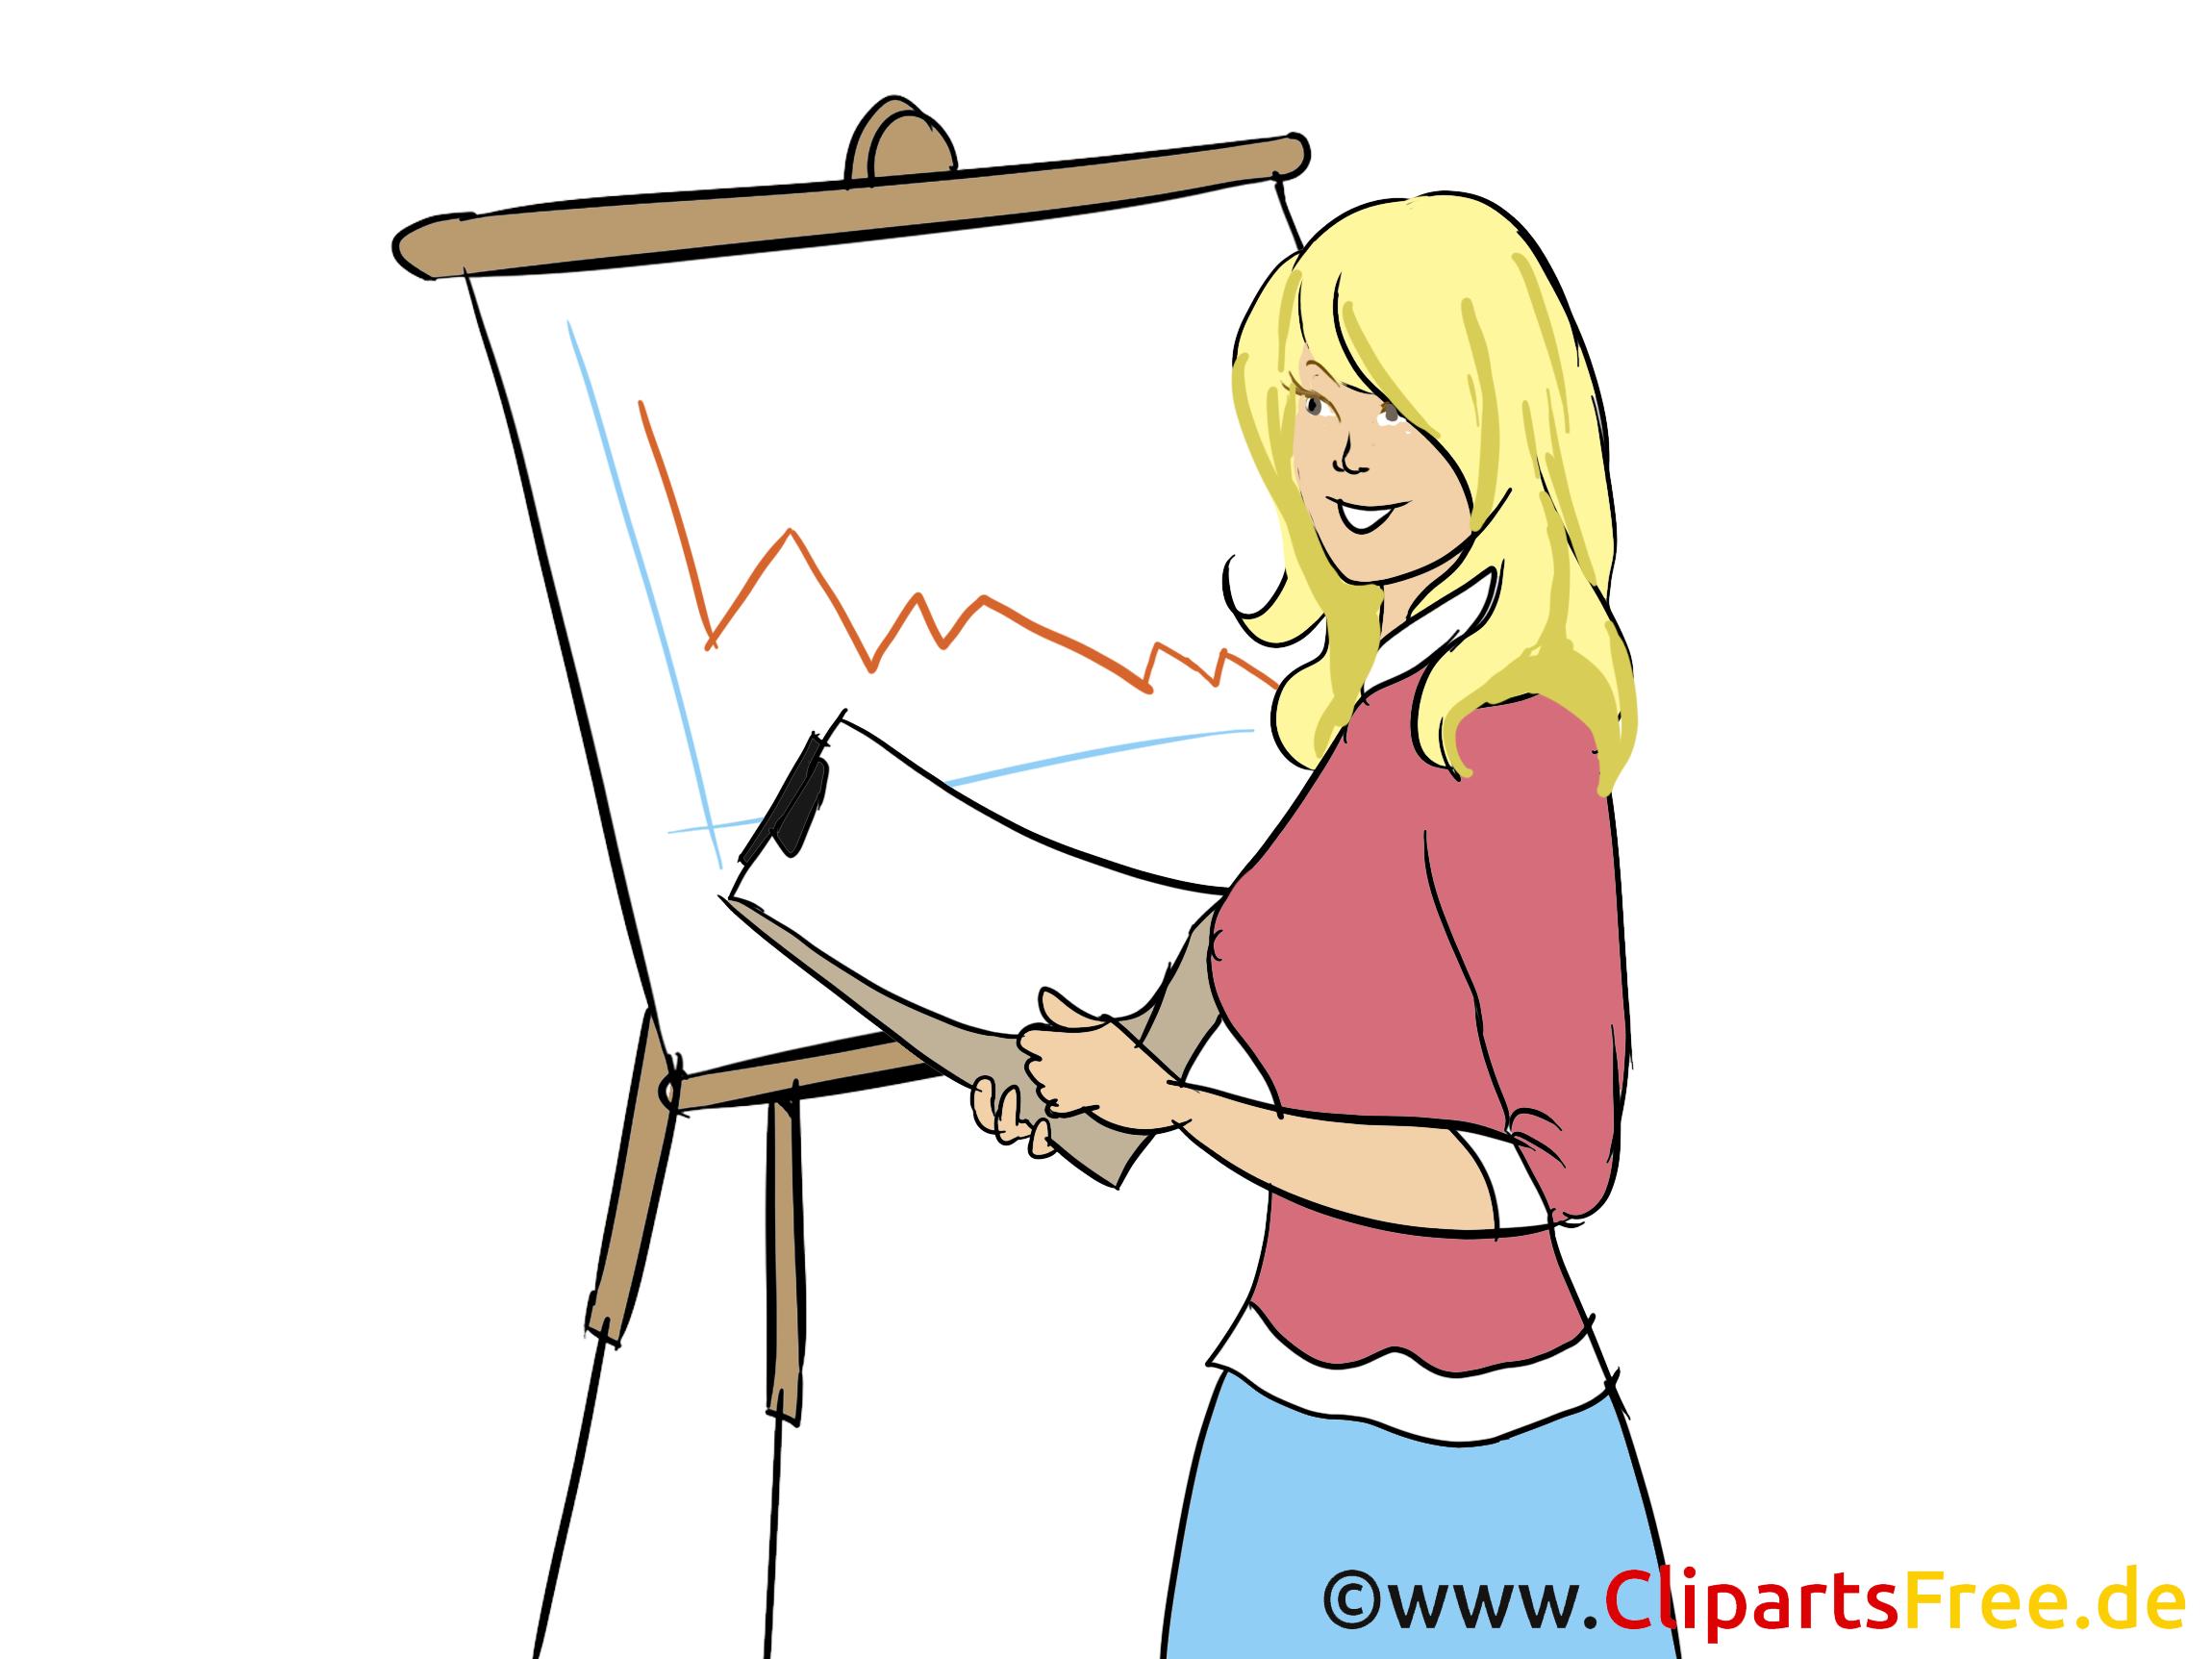 Marketing Bild, Clipart, Grafik, Cartoon, Illustration (30)